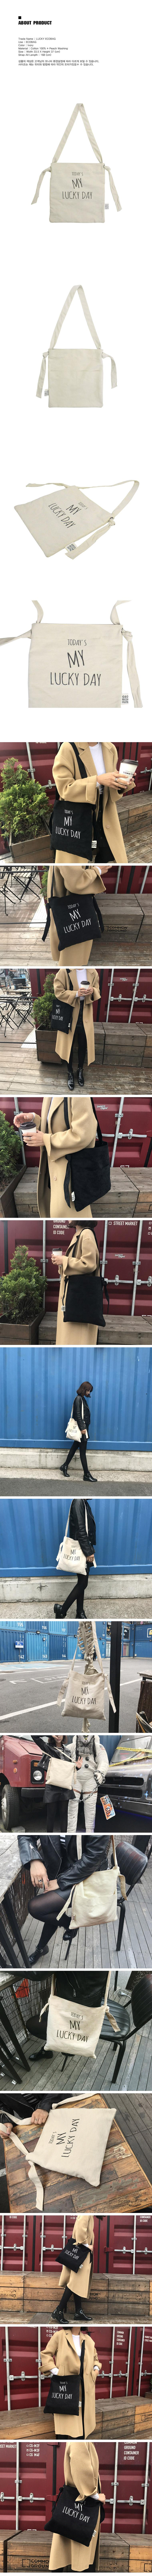 [AROUND TO B] LUCKY ECOBAG IVORY 럭키 에코백 아이보리